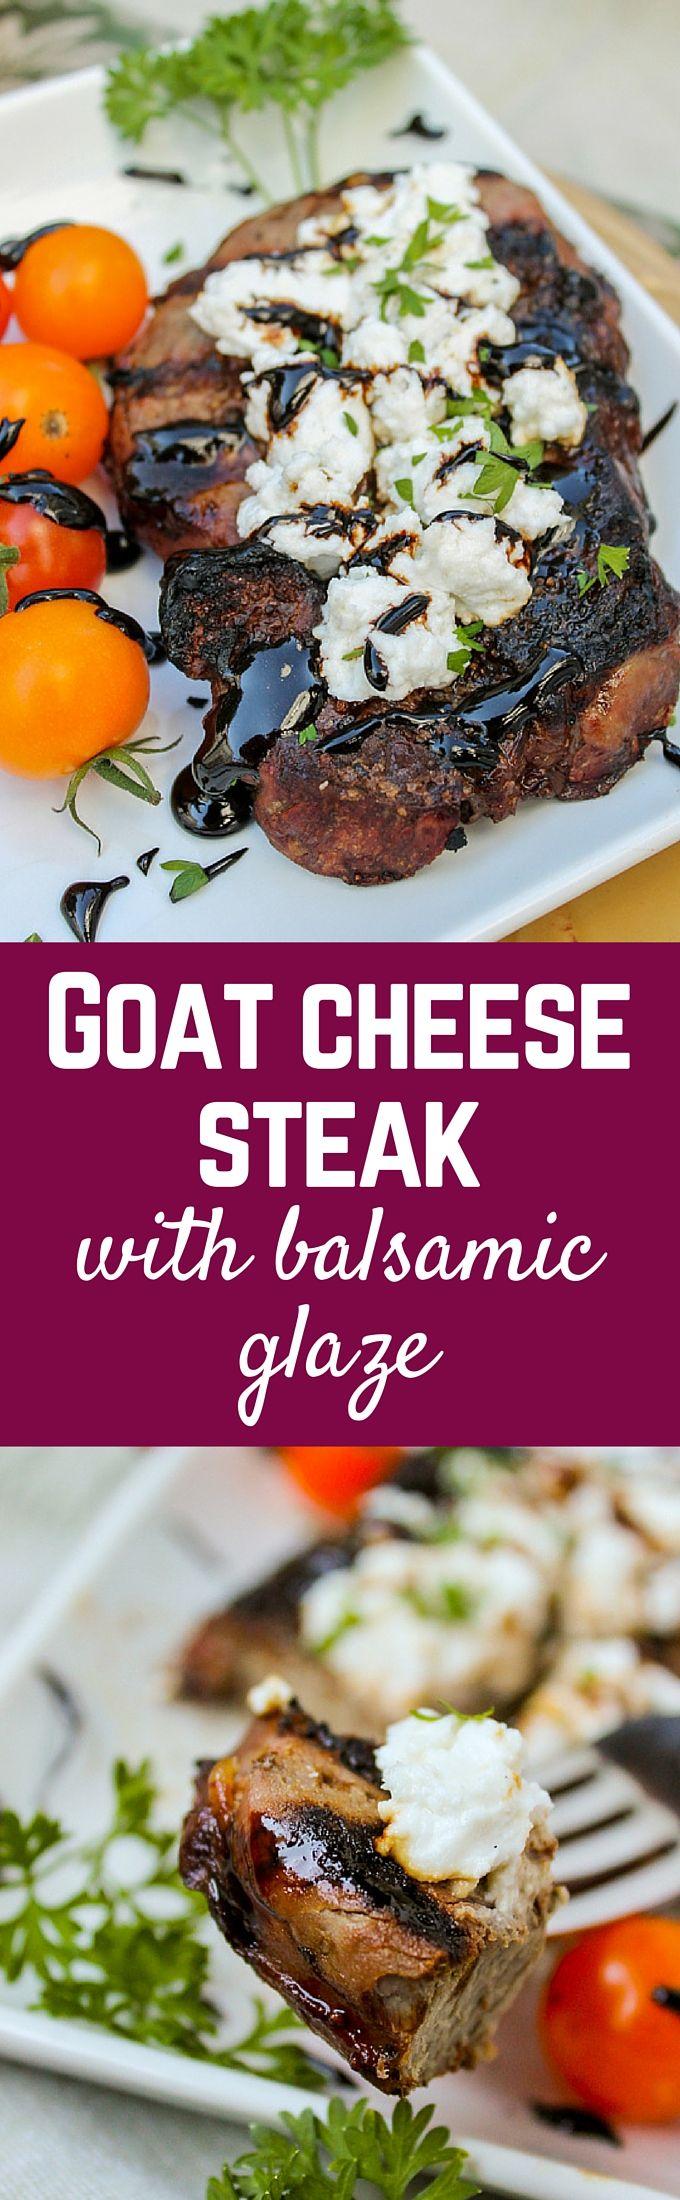 Goat Cheese Steak with Balsamic Glaze